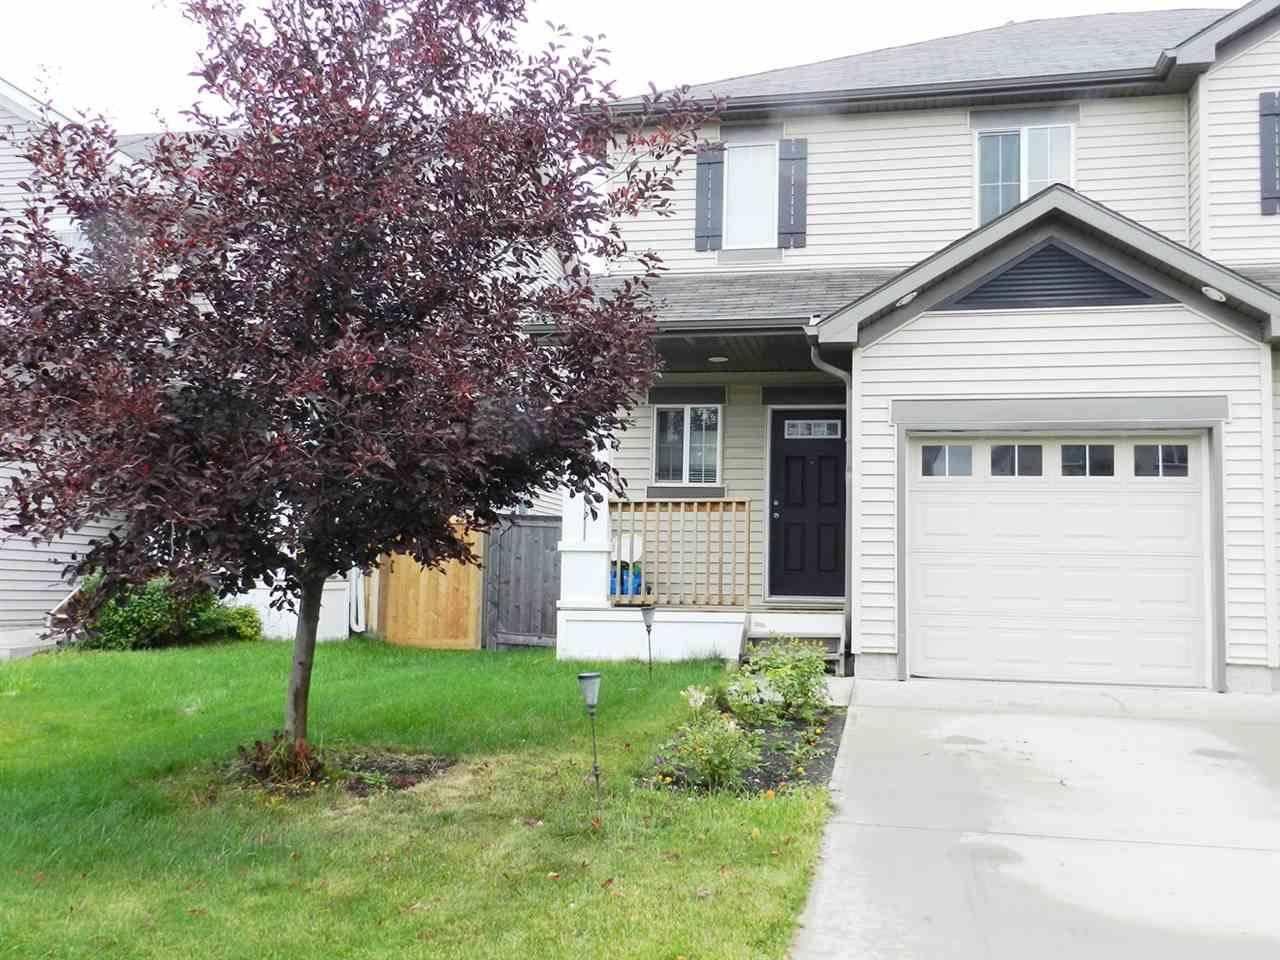 Townhouse for sale at 1617 65 St Sw Edmonton Alberta - MLS: E4194441